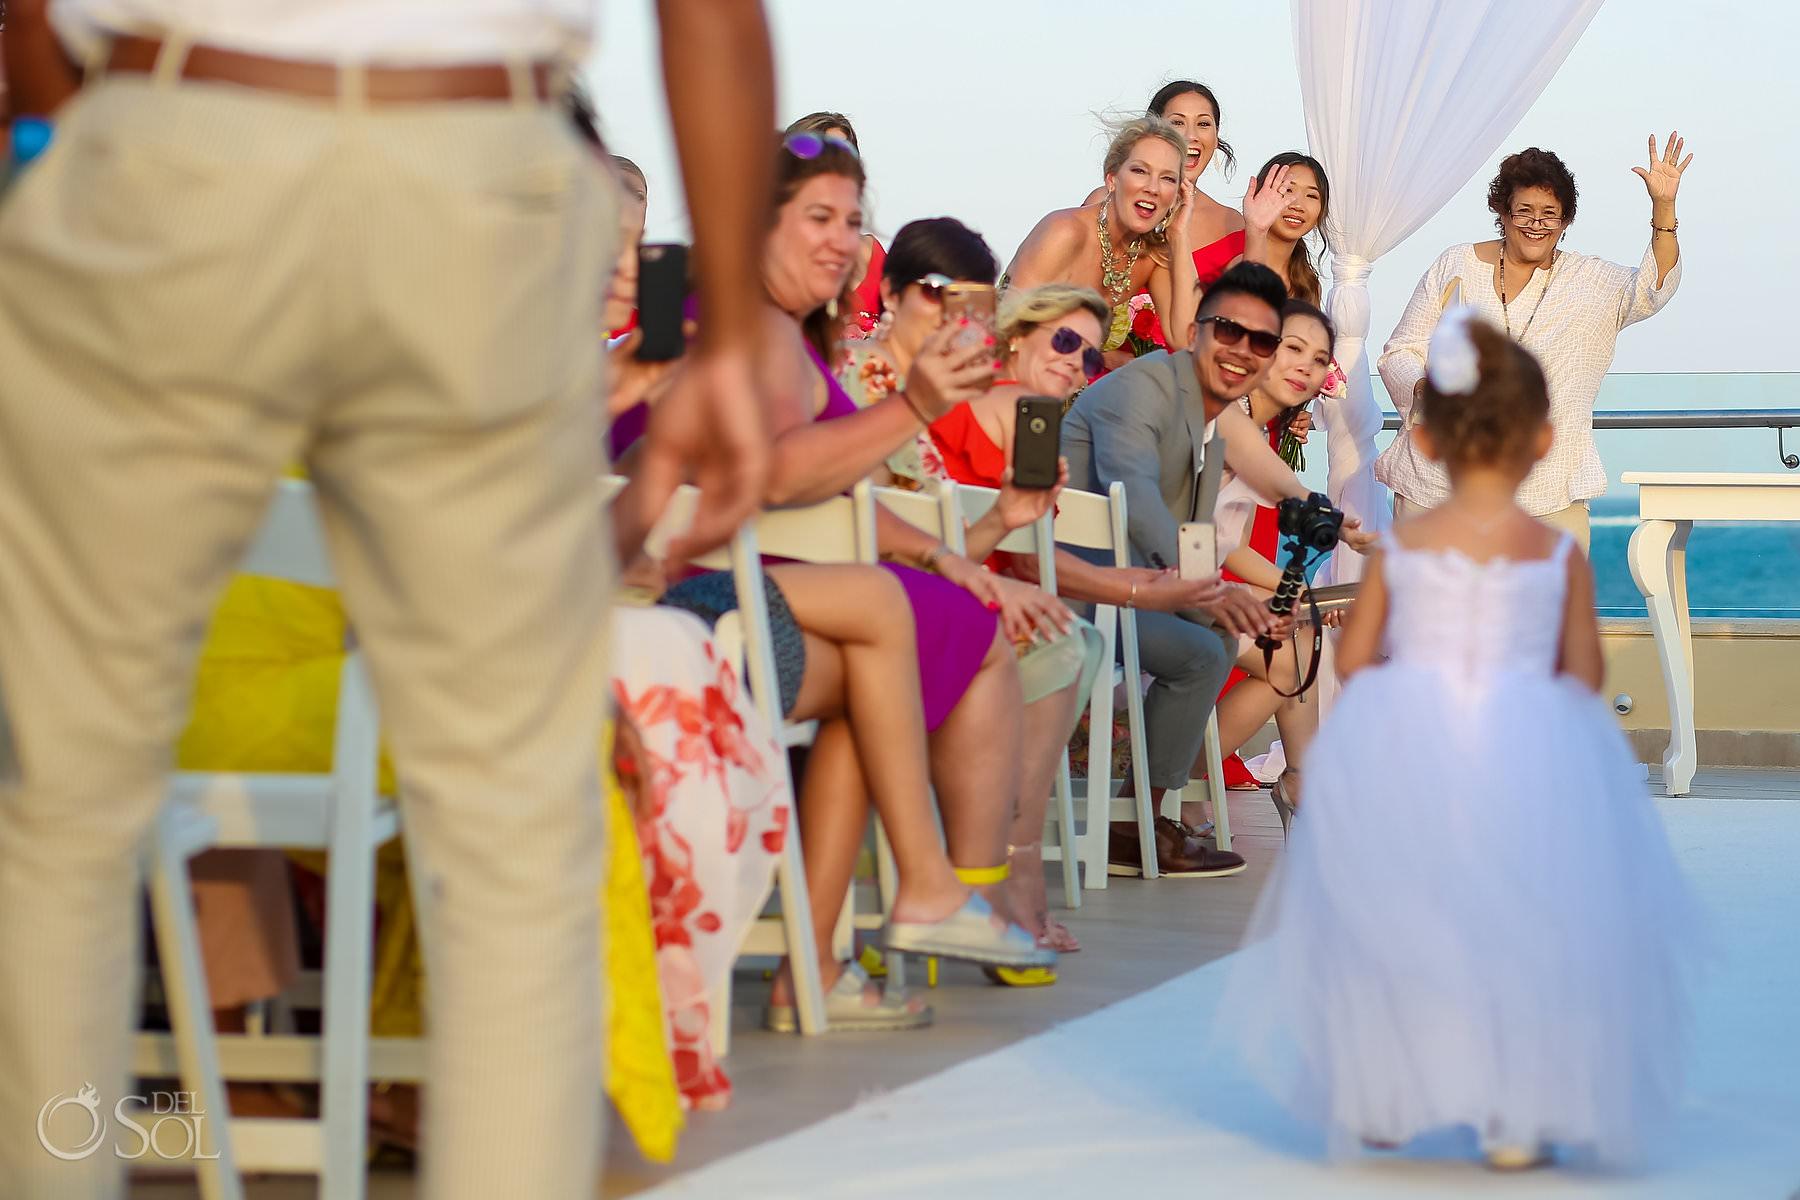 cutest flower girl moments Terrace wedding venue Dreams Riviera Cancun Mexico